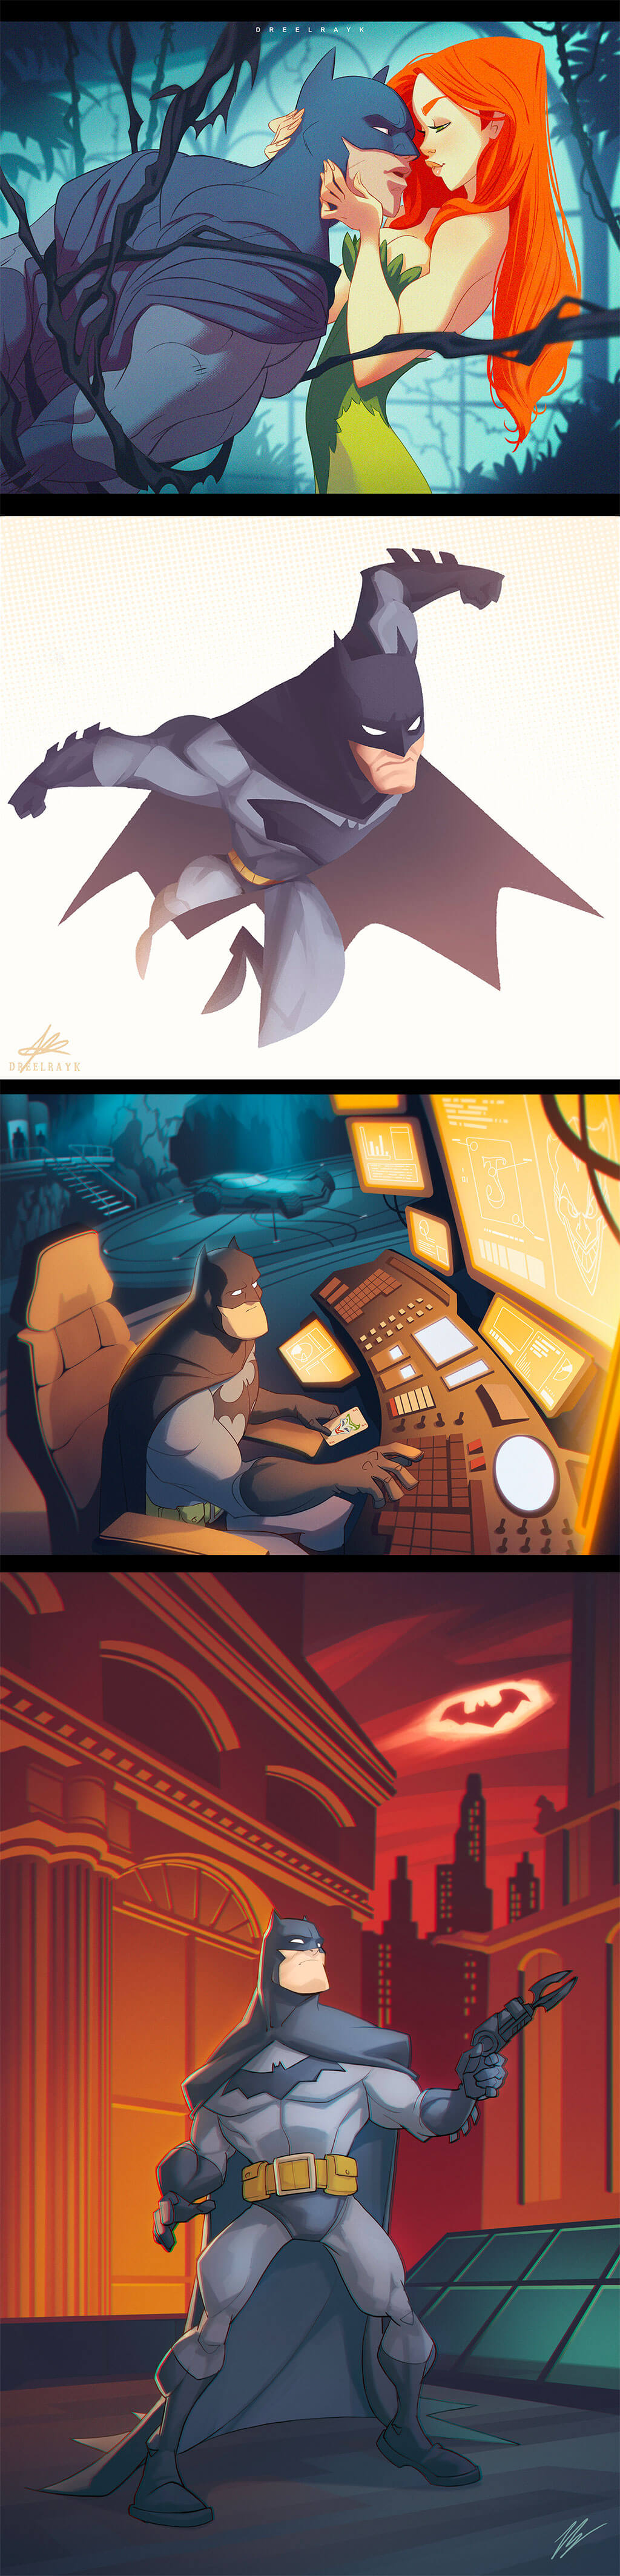 "Batman Fan Art by Valerio ""Dreelrayk"" Buonfantino"